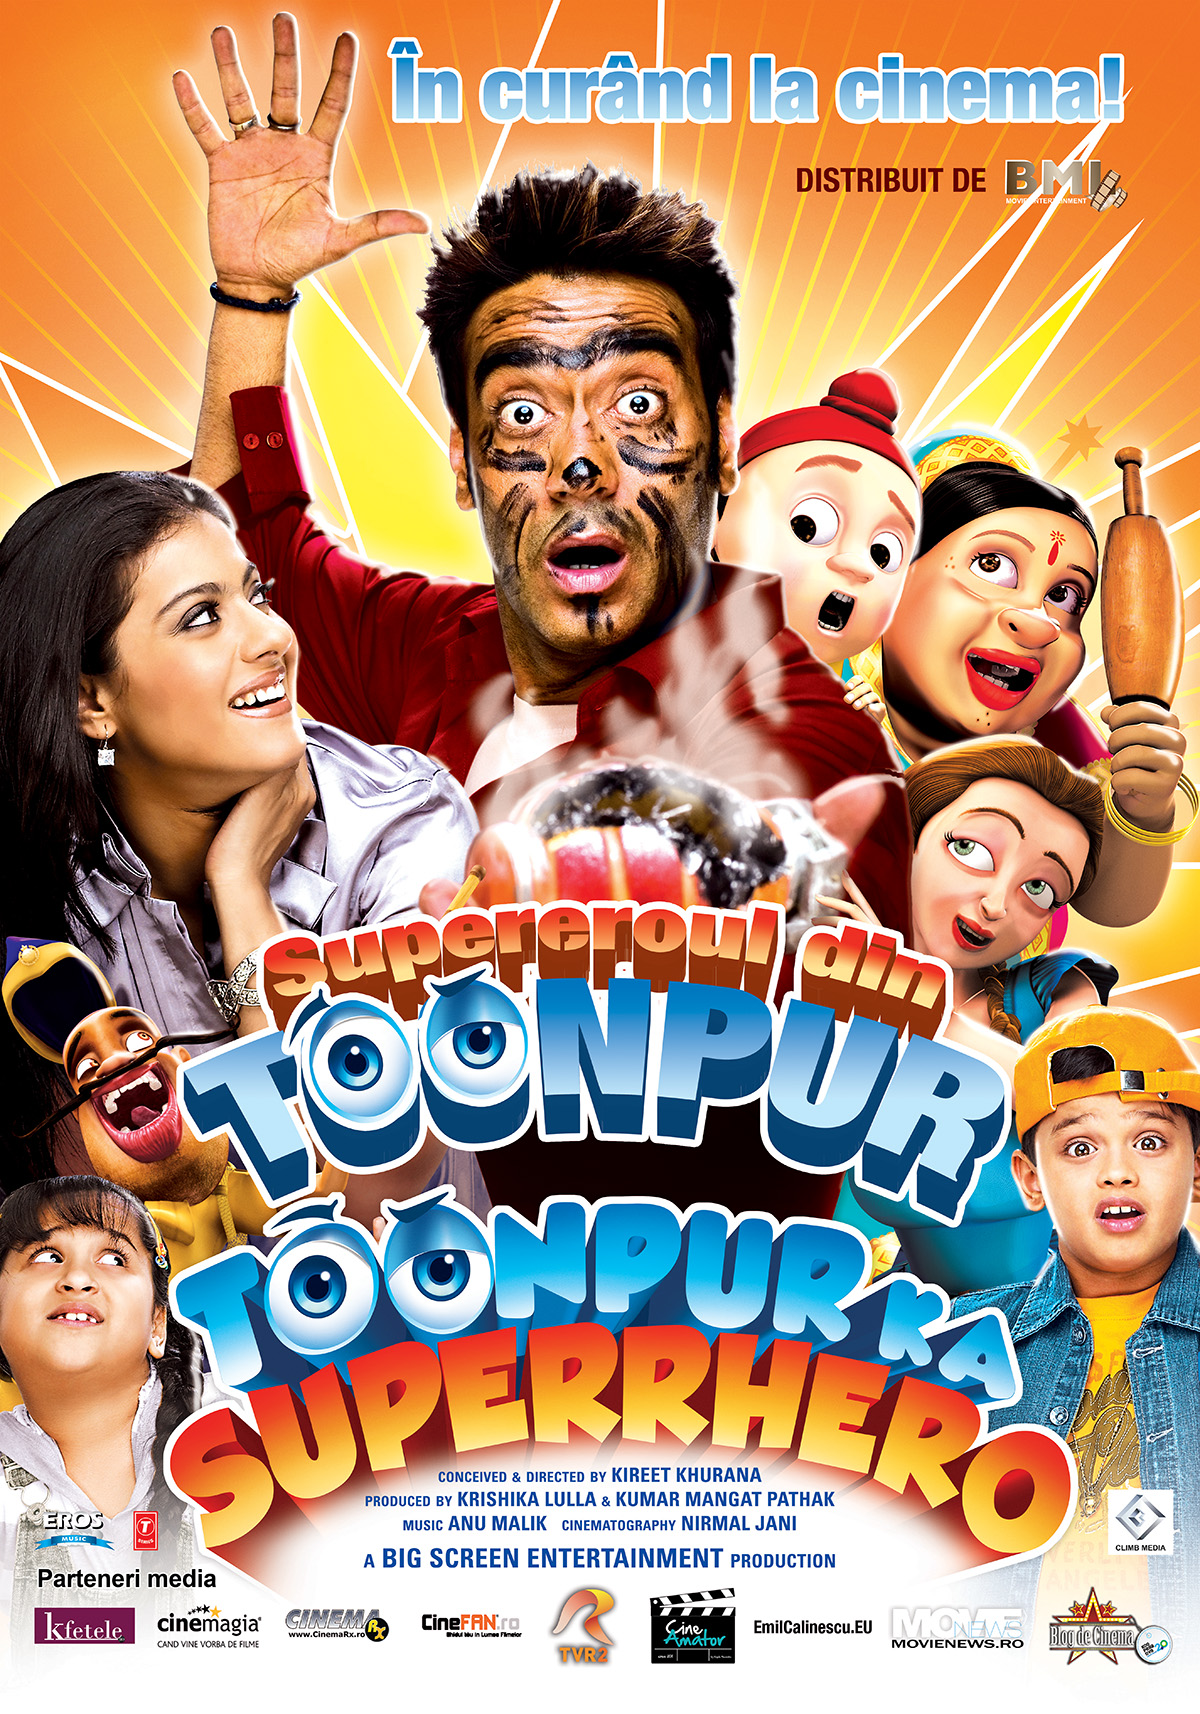 Supereroul din Toonpur – 2D Dublat / Toonpur Ka Superrhero (Premiera)